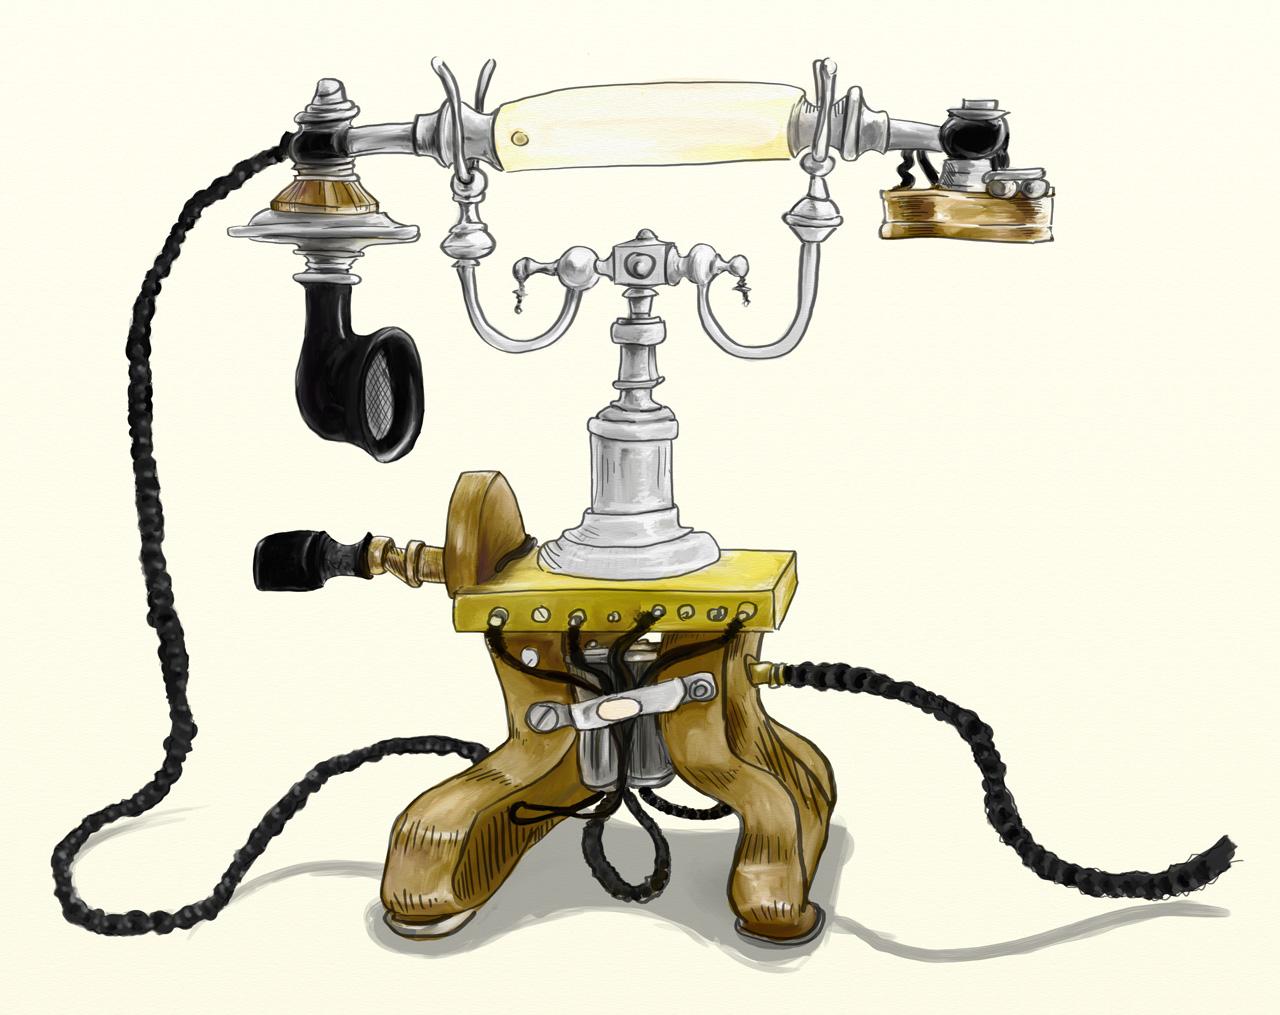 Ottaman rotary dial